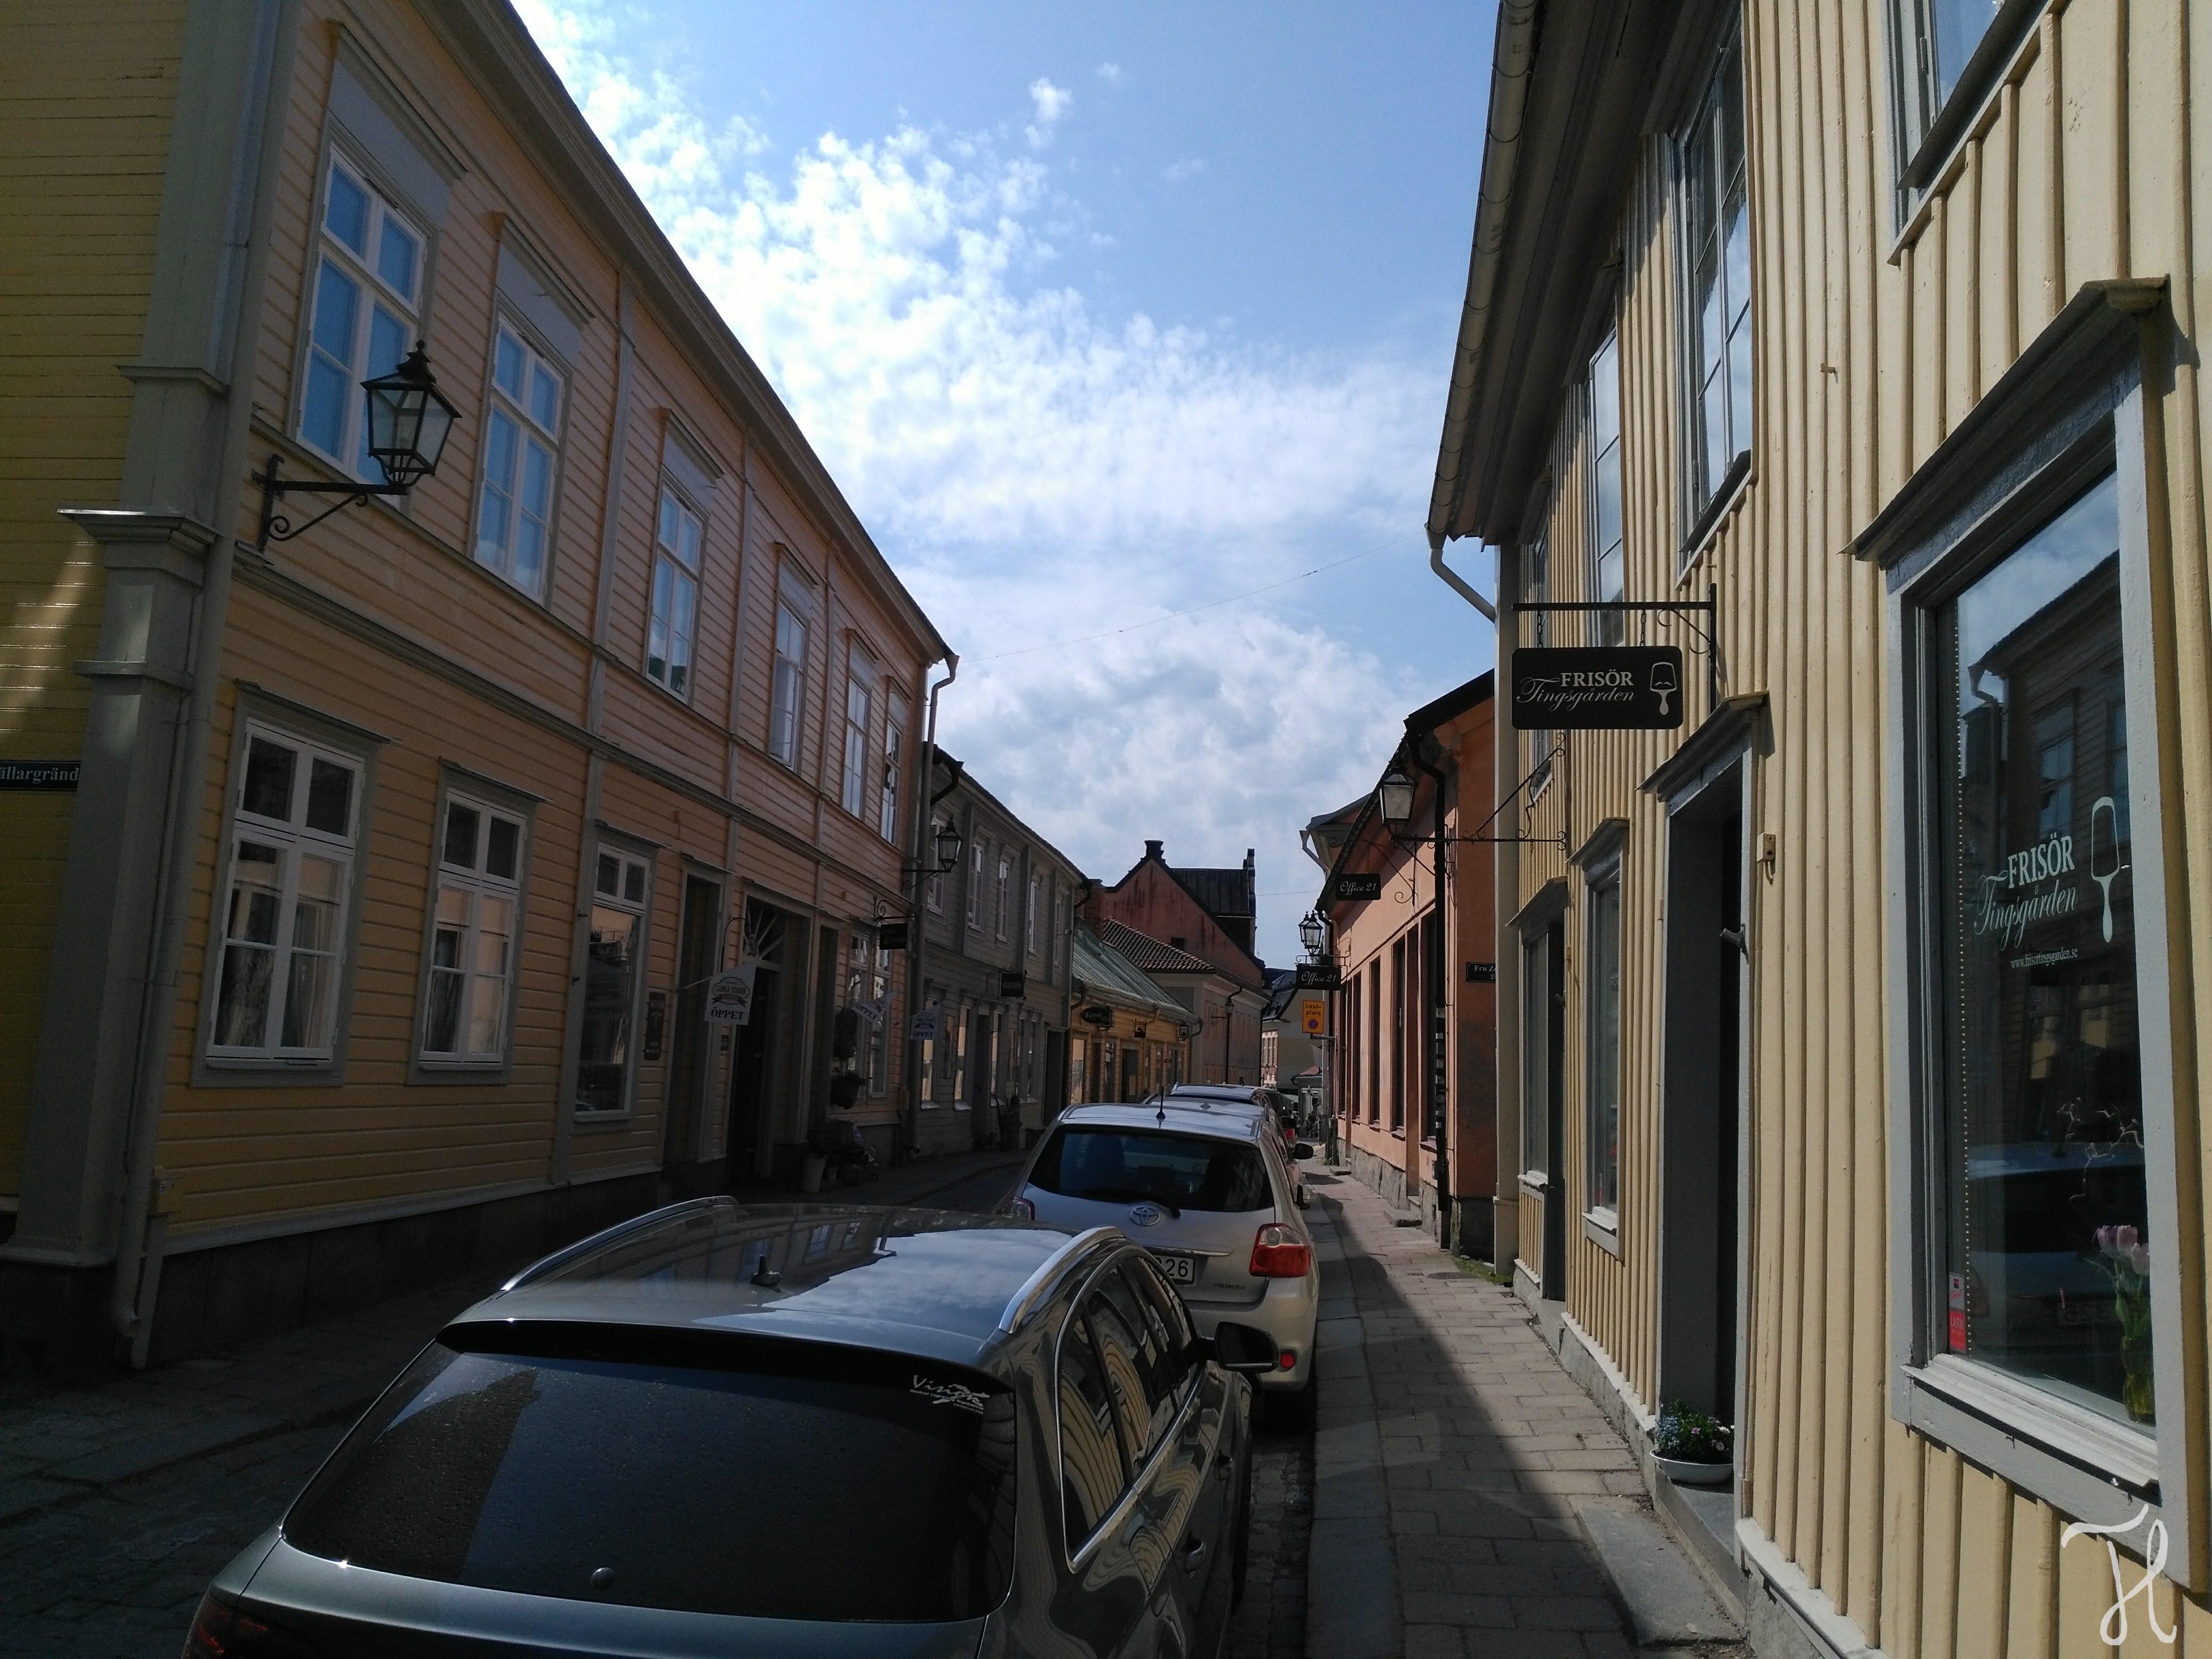 EskilstunaKöpmangatan_20180511_TH_02.png